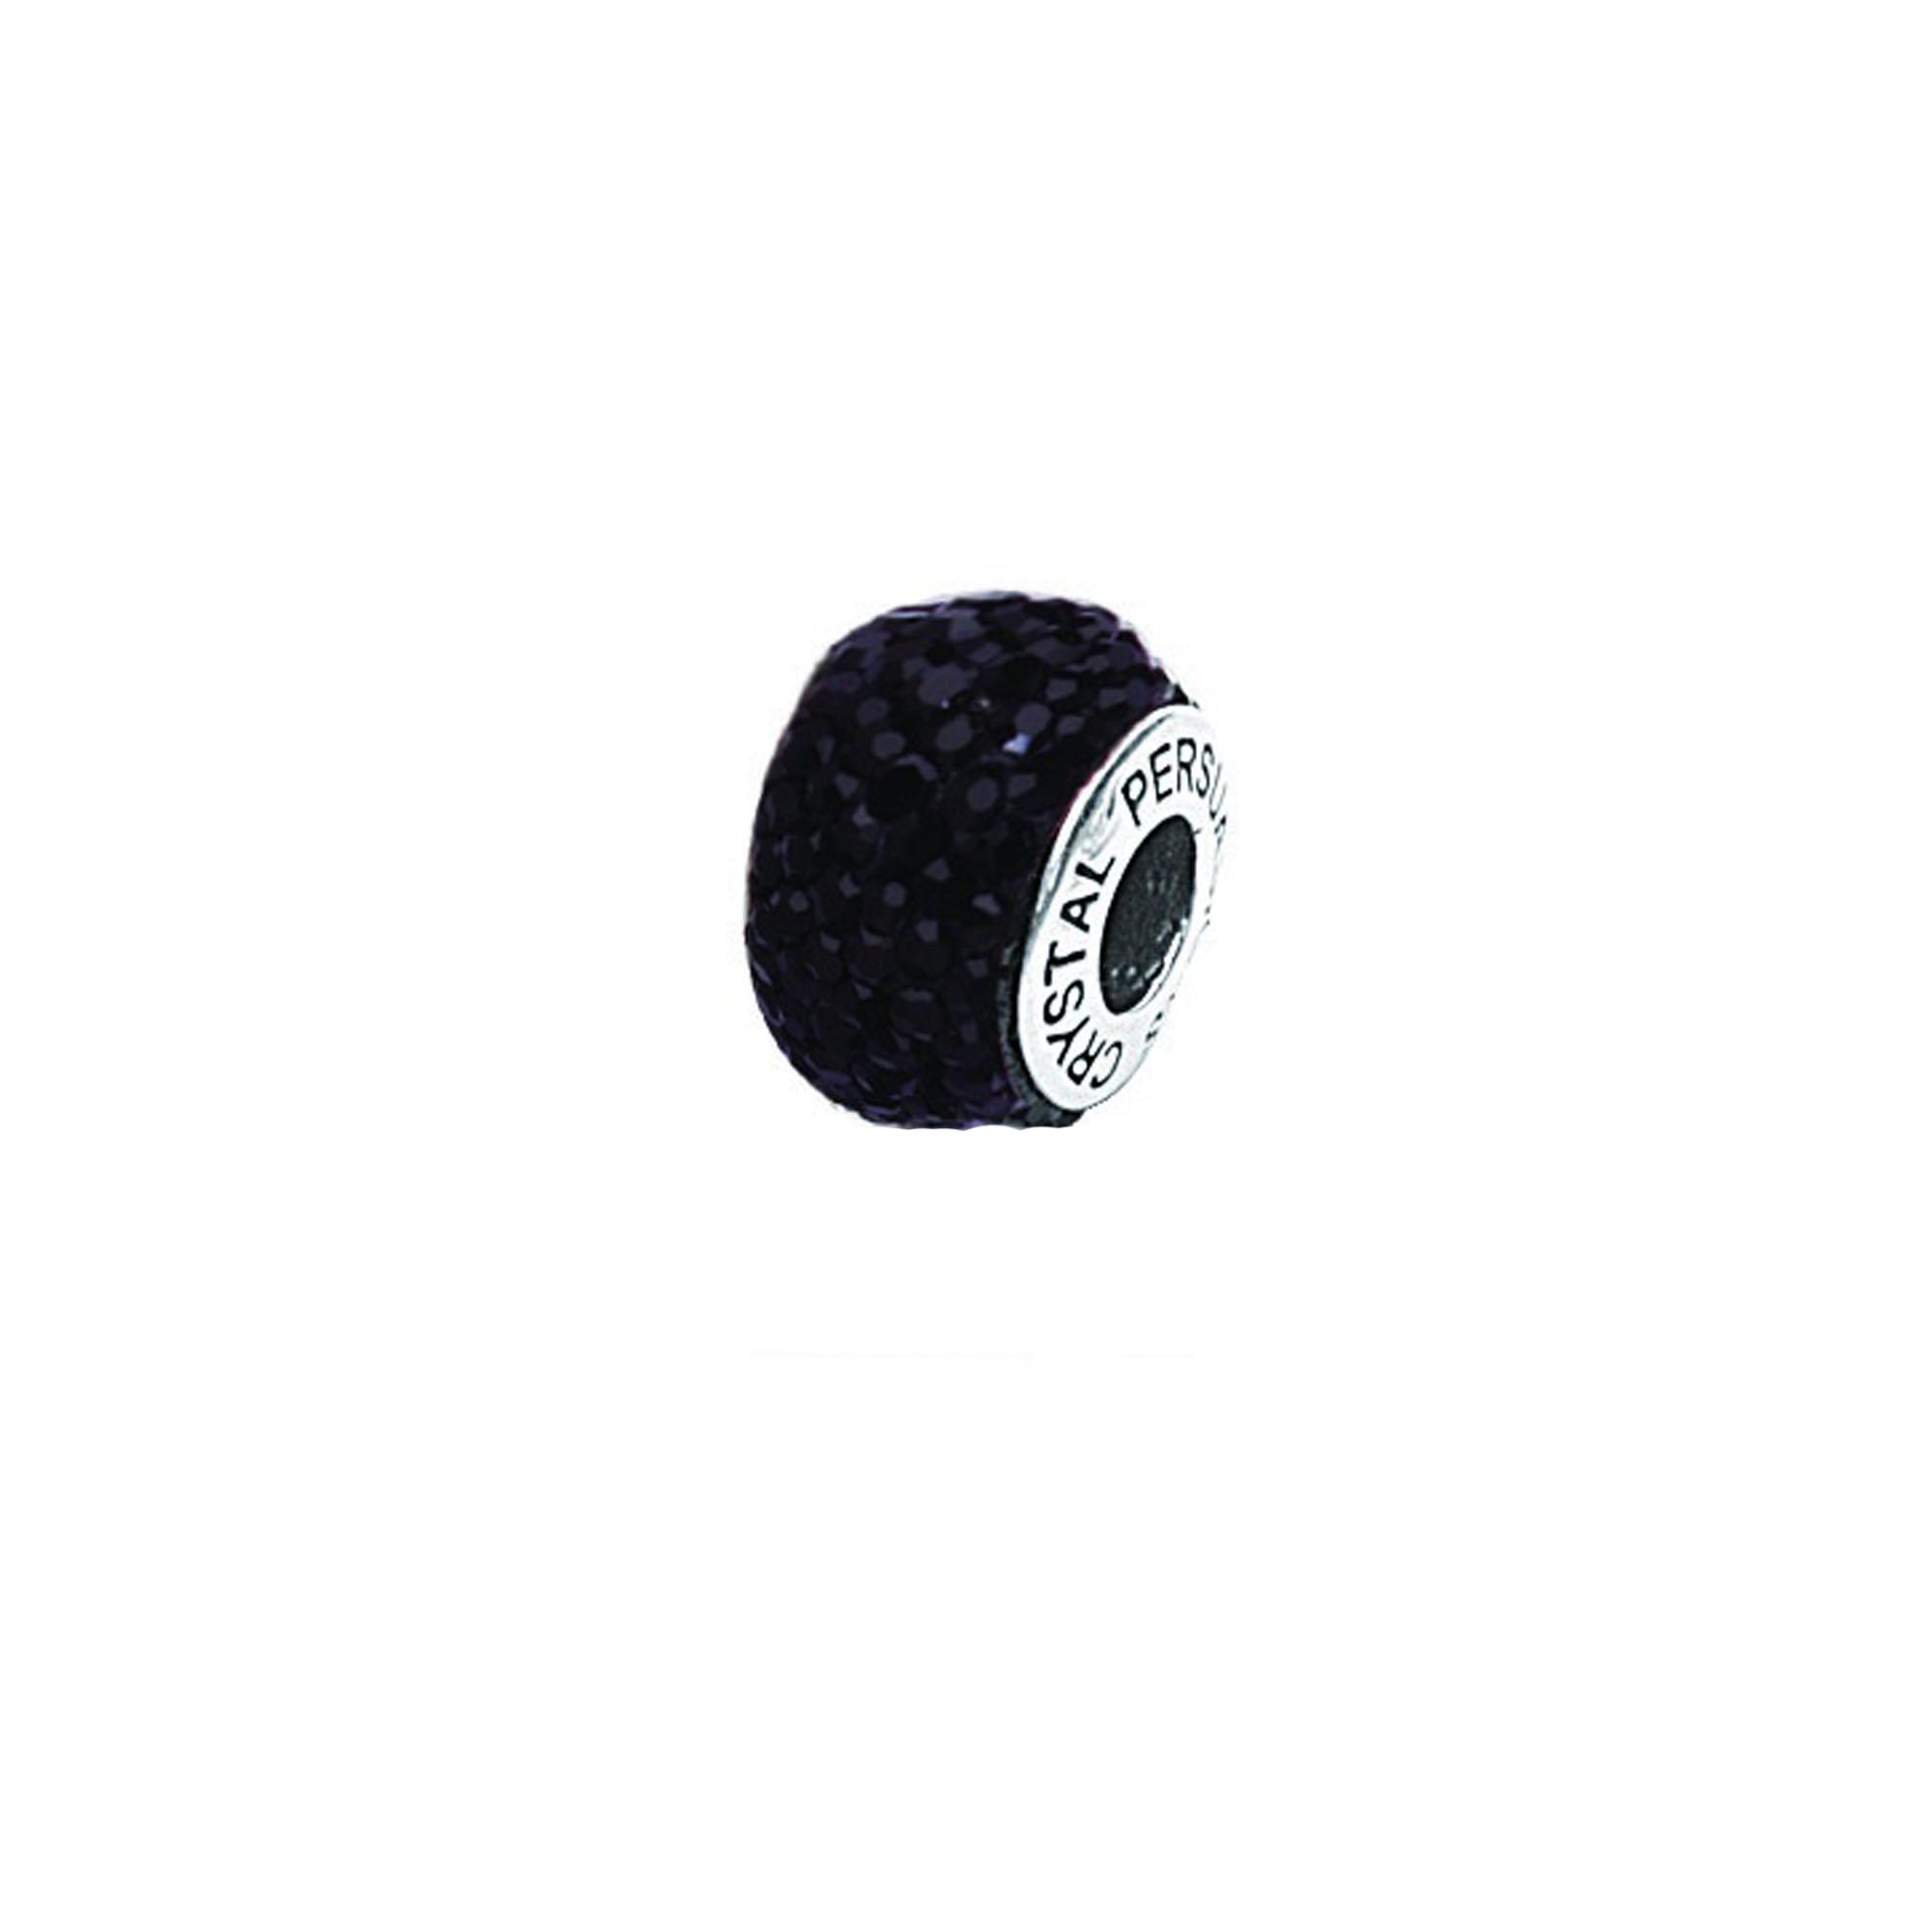 Silver Pendant, Black Crystal Bead